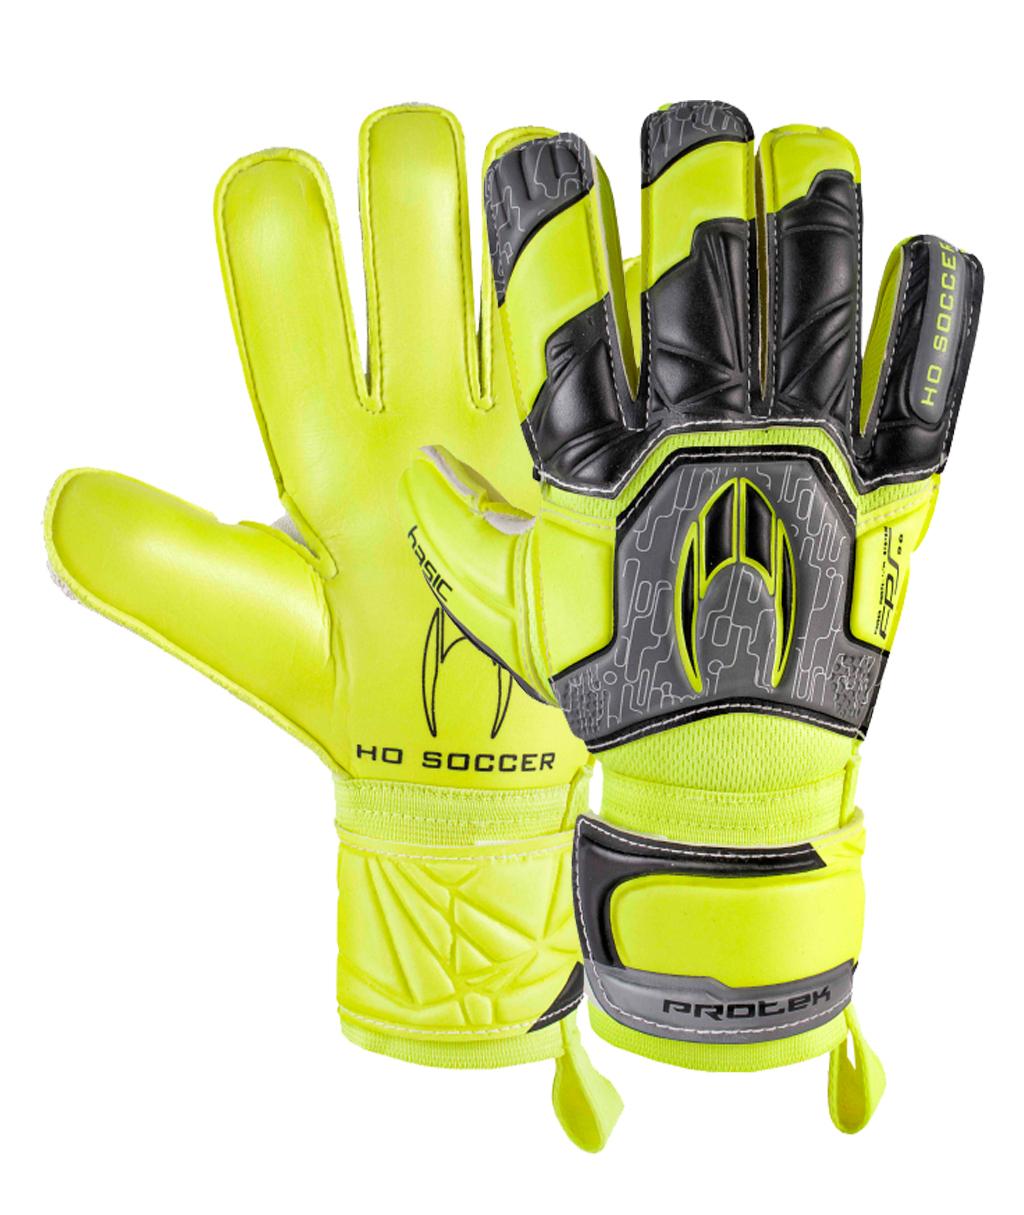 Перчатки вратарские HO Soccer BASIC PROTEK FLAT POWER LIME 051.0717